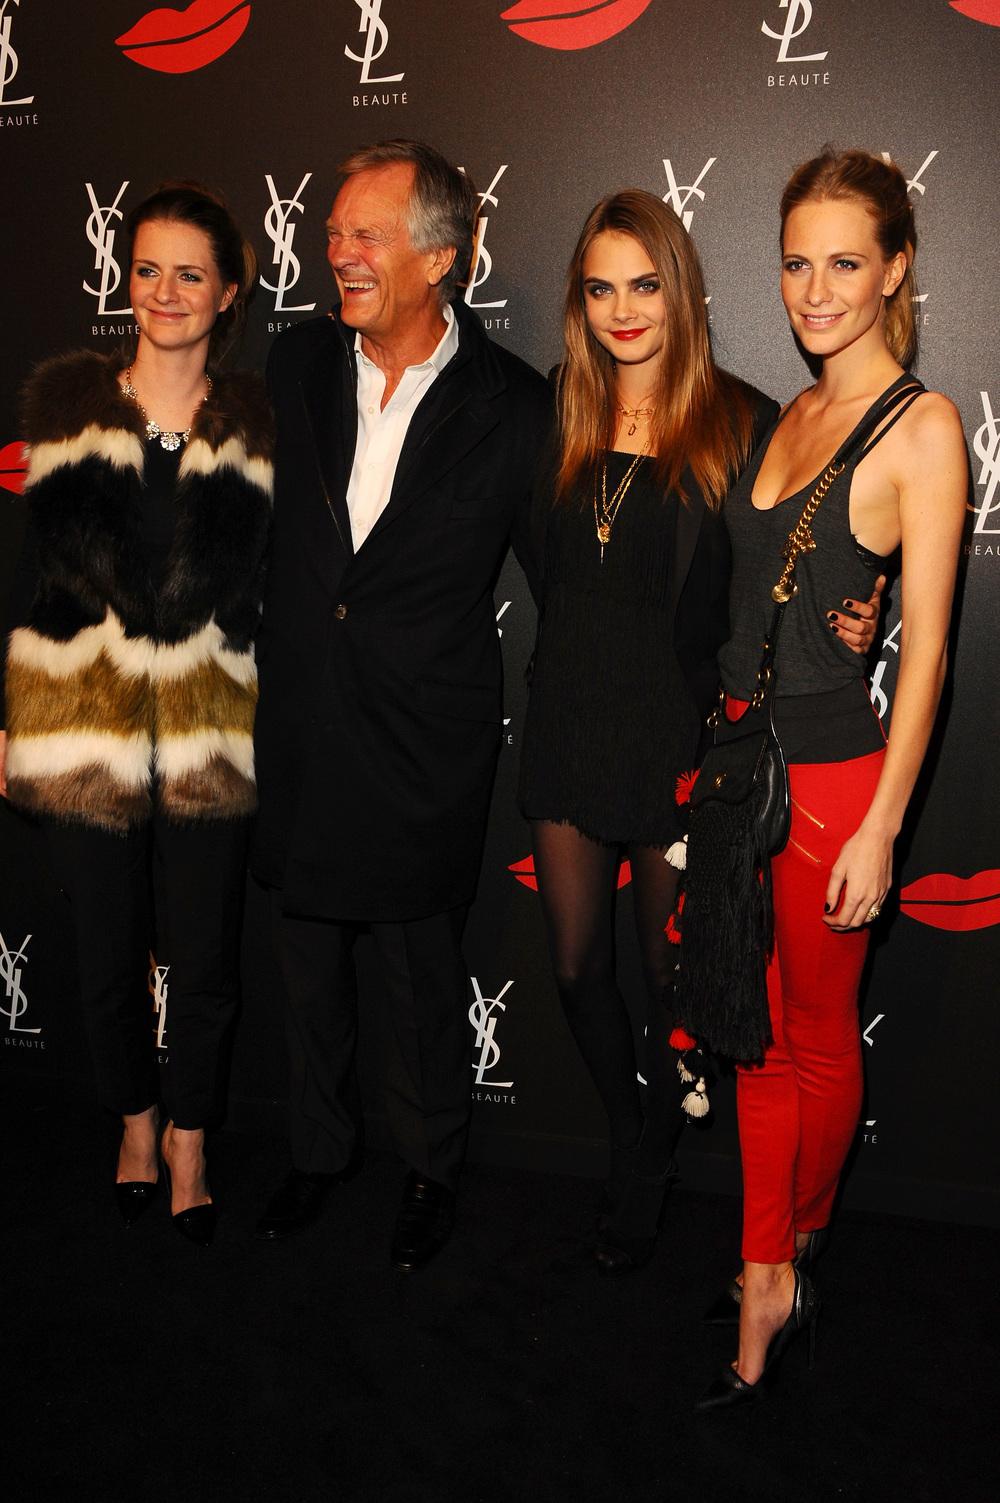 Chloe, Charlie, Cara & Poppy Delevingne